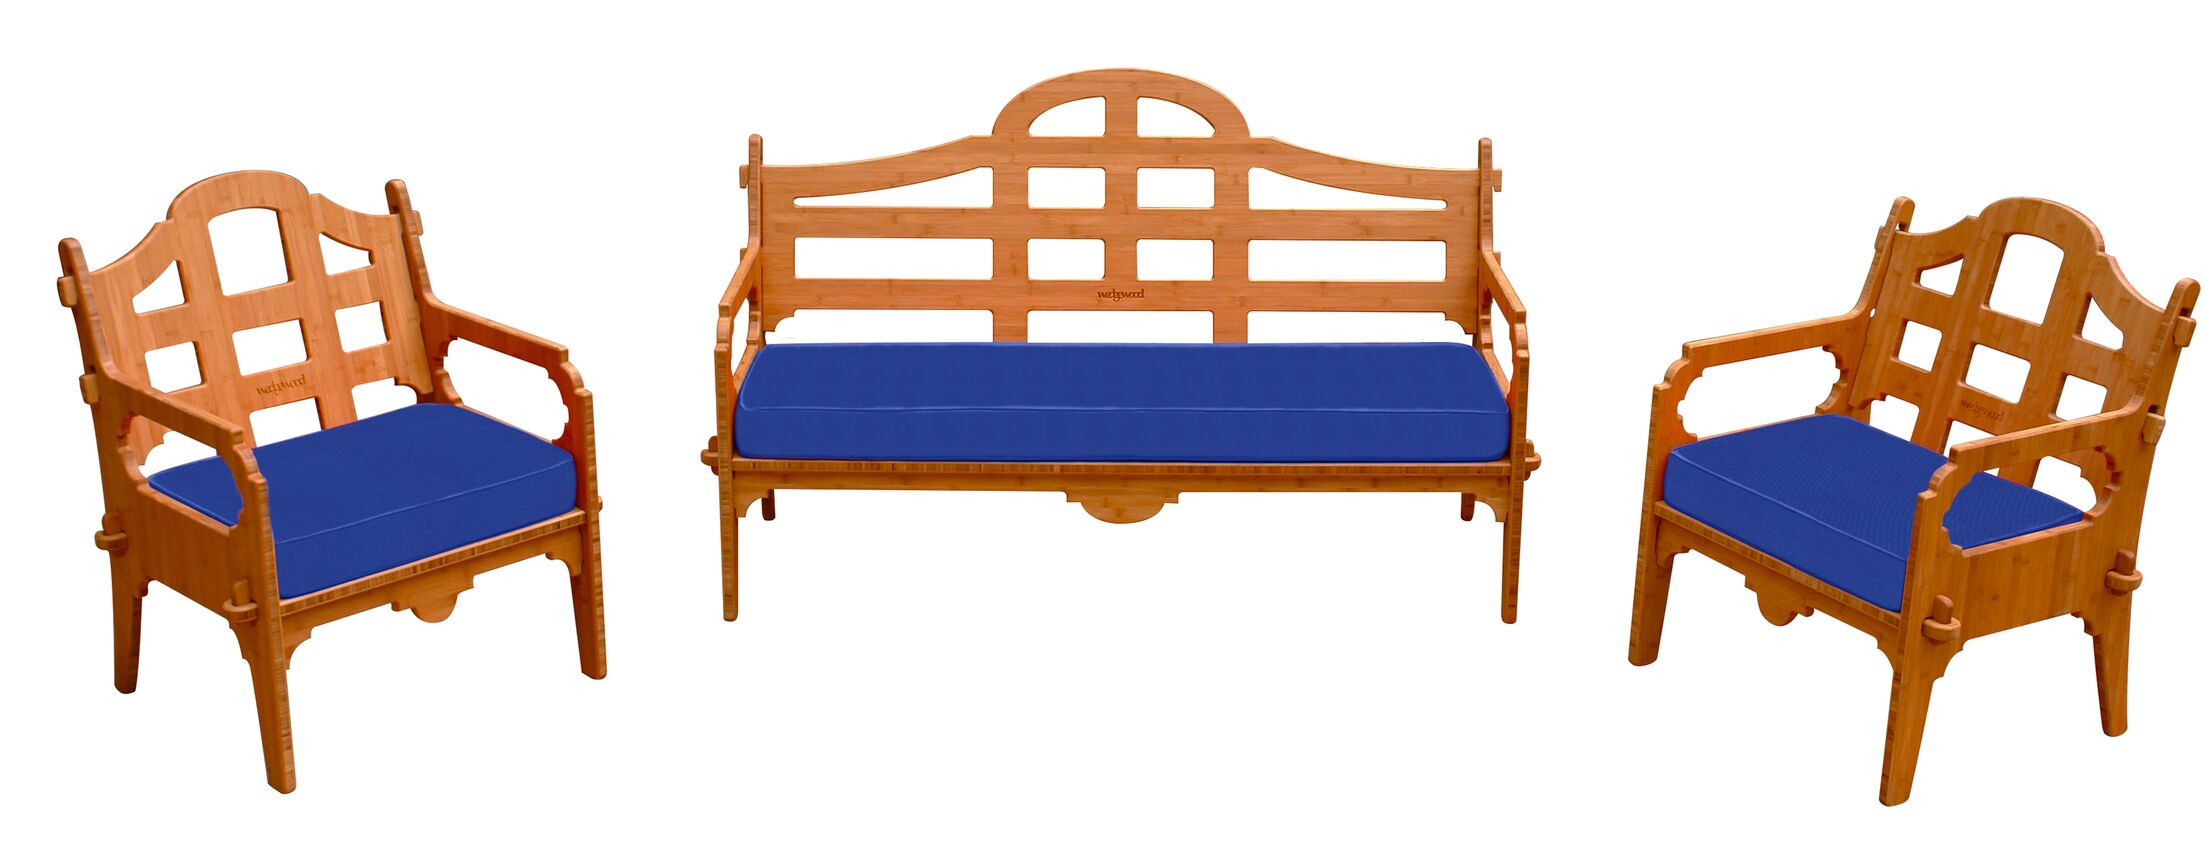 Burliegh 3 Piece Sunbrella Sofa Set with Cushions Fabric: Blue